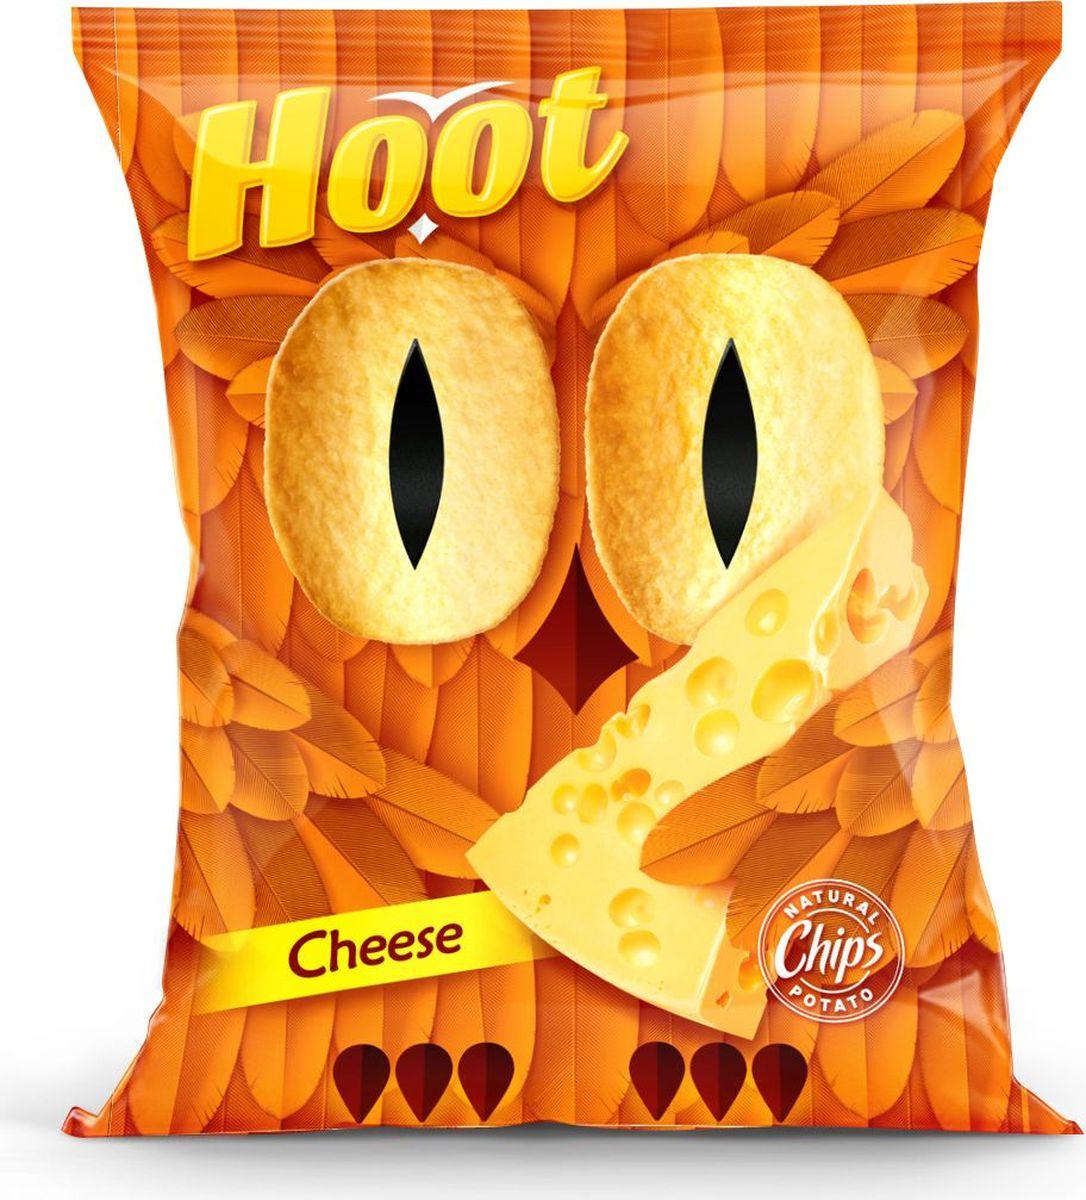 Hoot Чипсы, сыр, 150 г чайный набор give a hoot